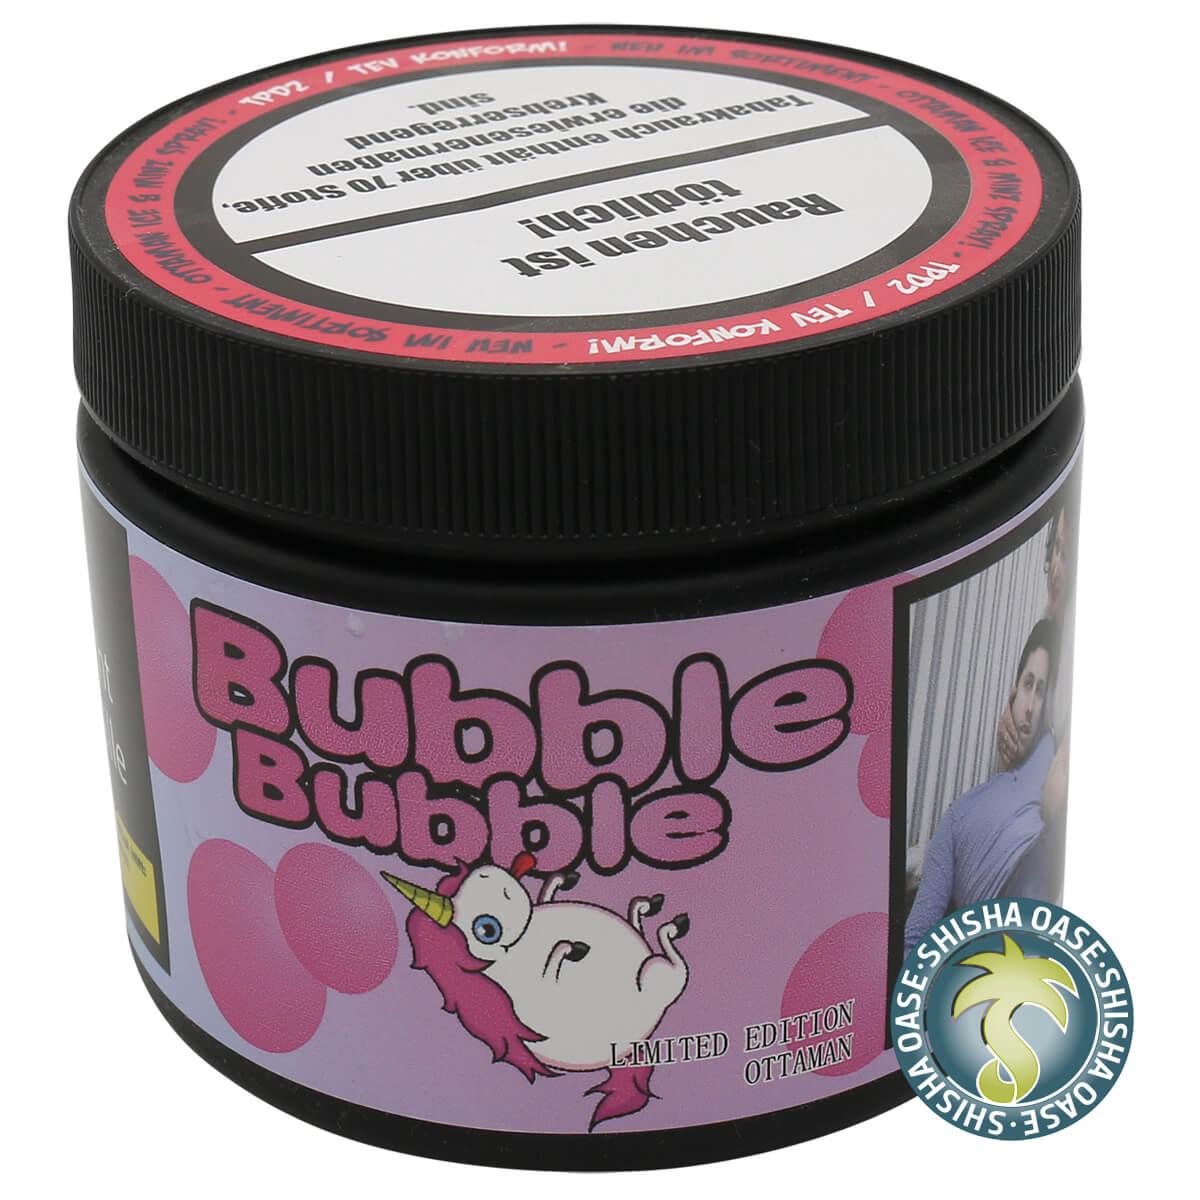 Ottaman Tabak 200g | Bubble Bubble